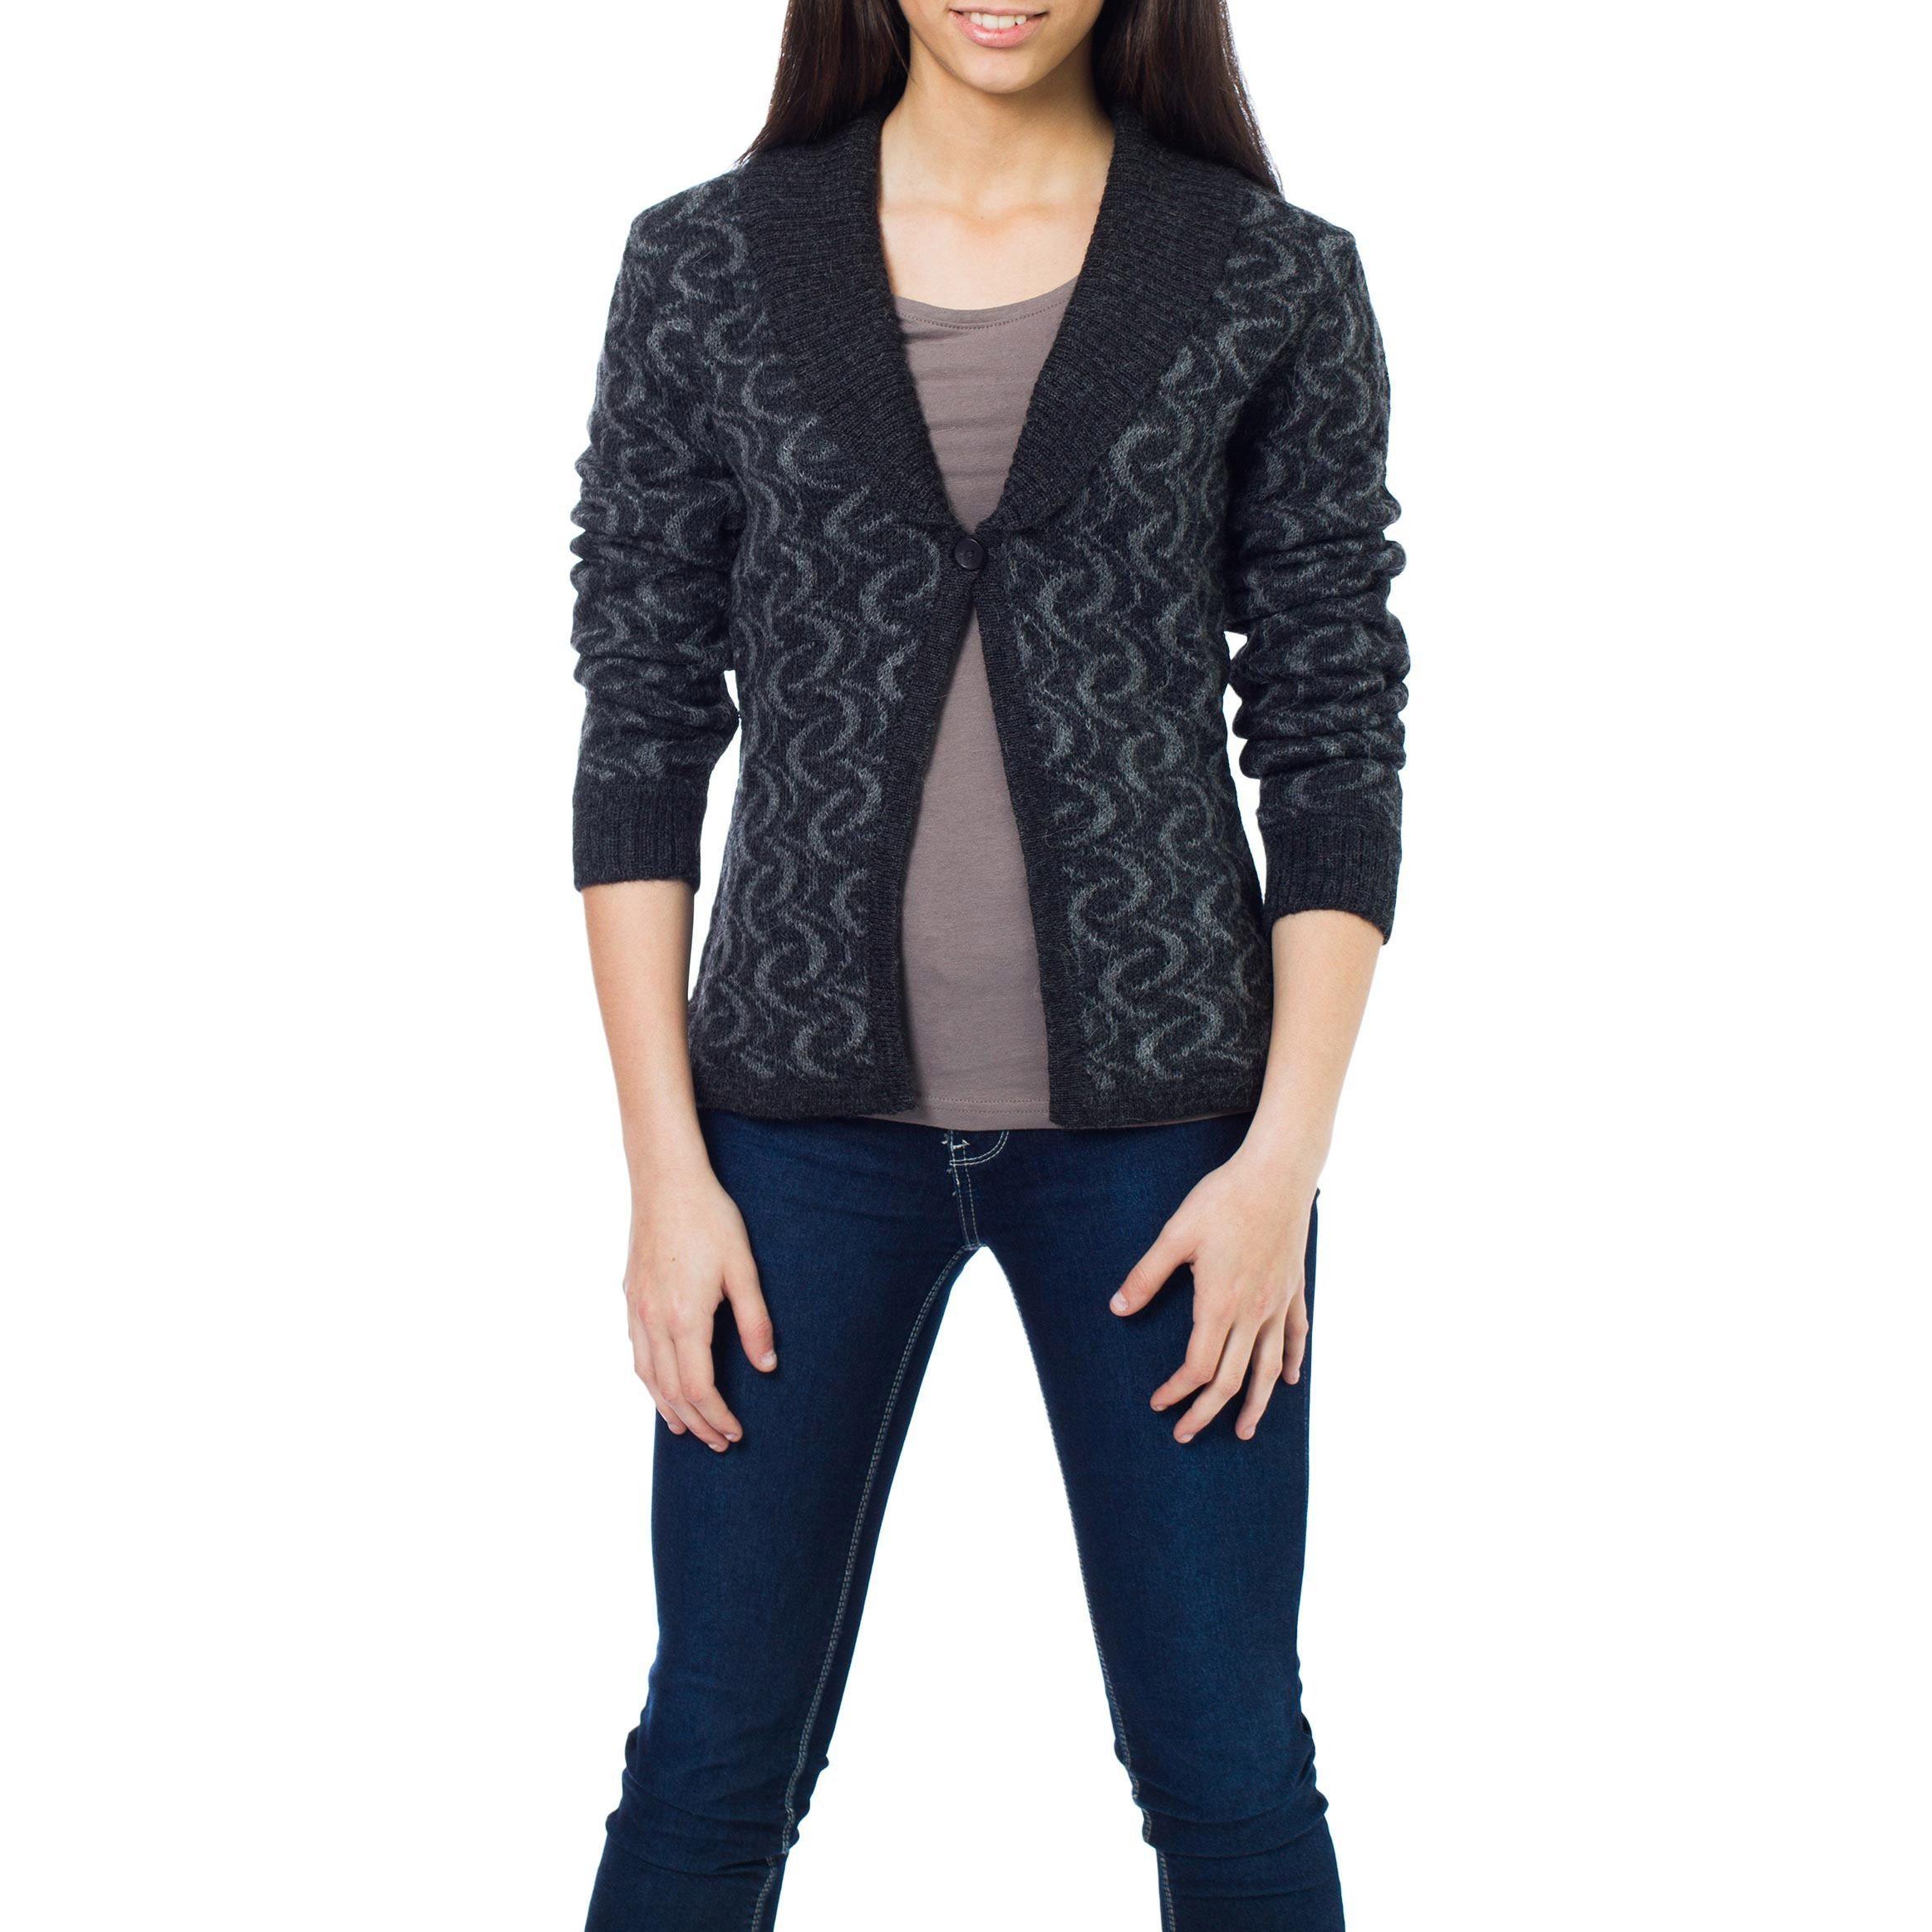 Novica Alpaca 'Evening Shadows' Cardigan Sweater | sweater ...